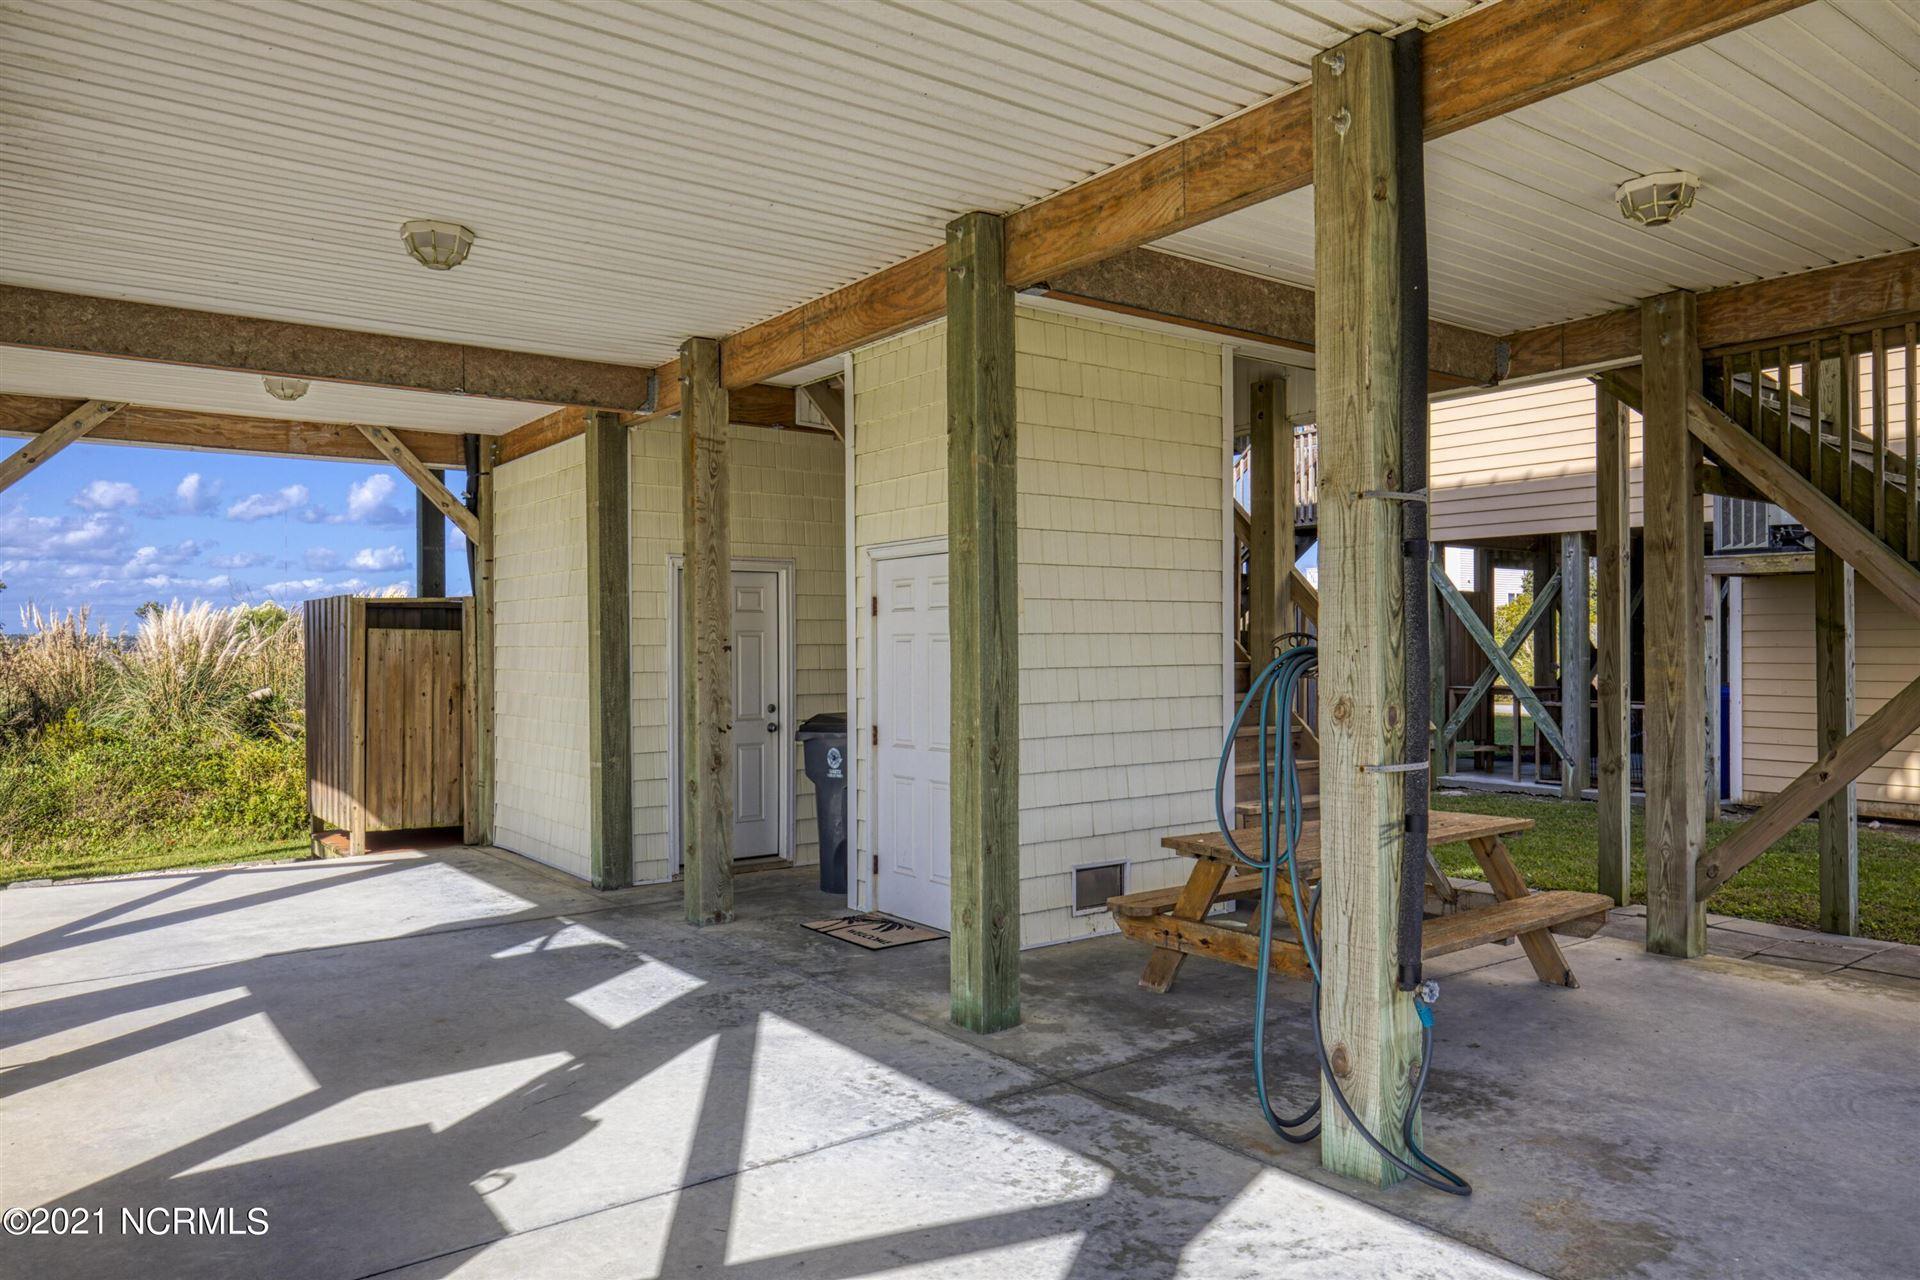 Photo of 3279 Island Drive, North Topsail Beach, NC 28460 (MLS # 100296618)